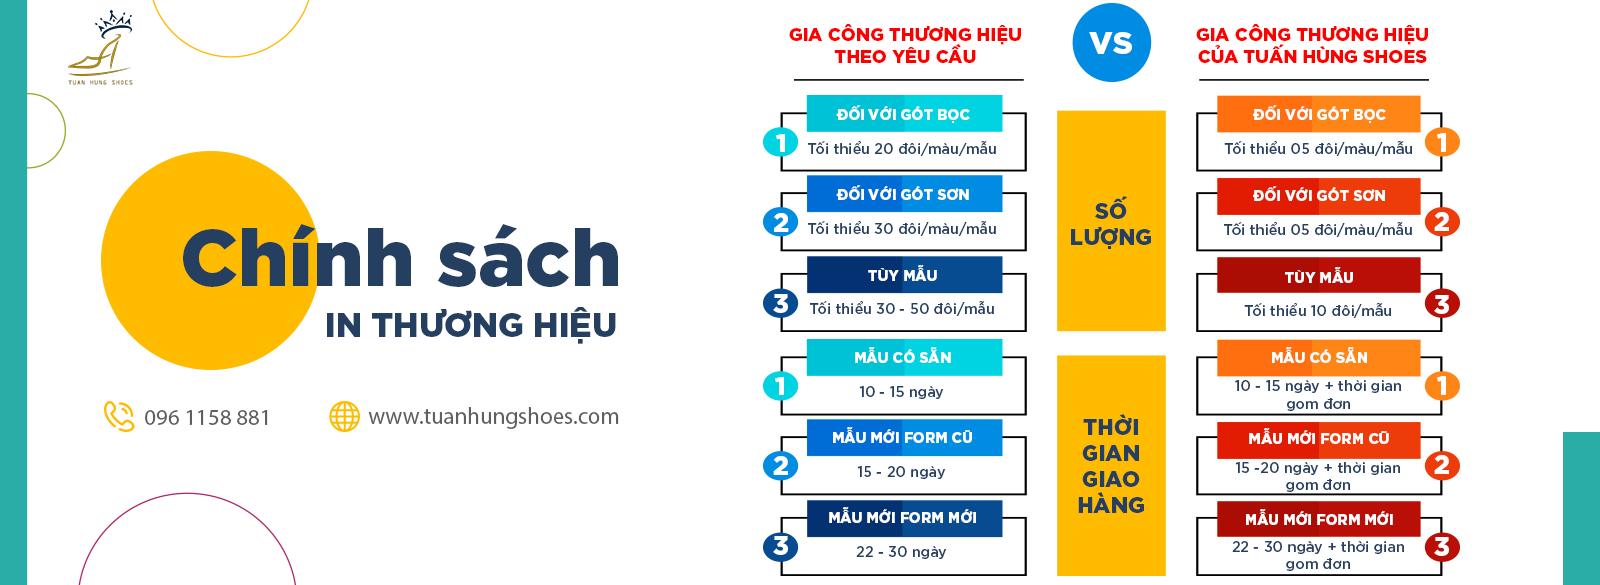 chinh sach in thuong hieu tuan hung shoes 2